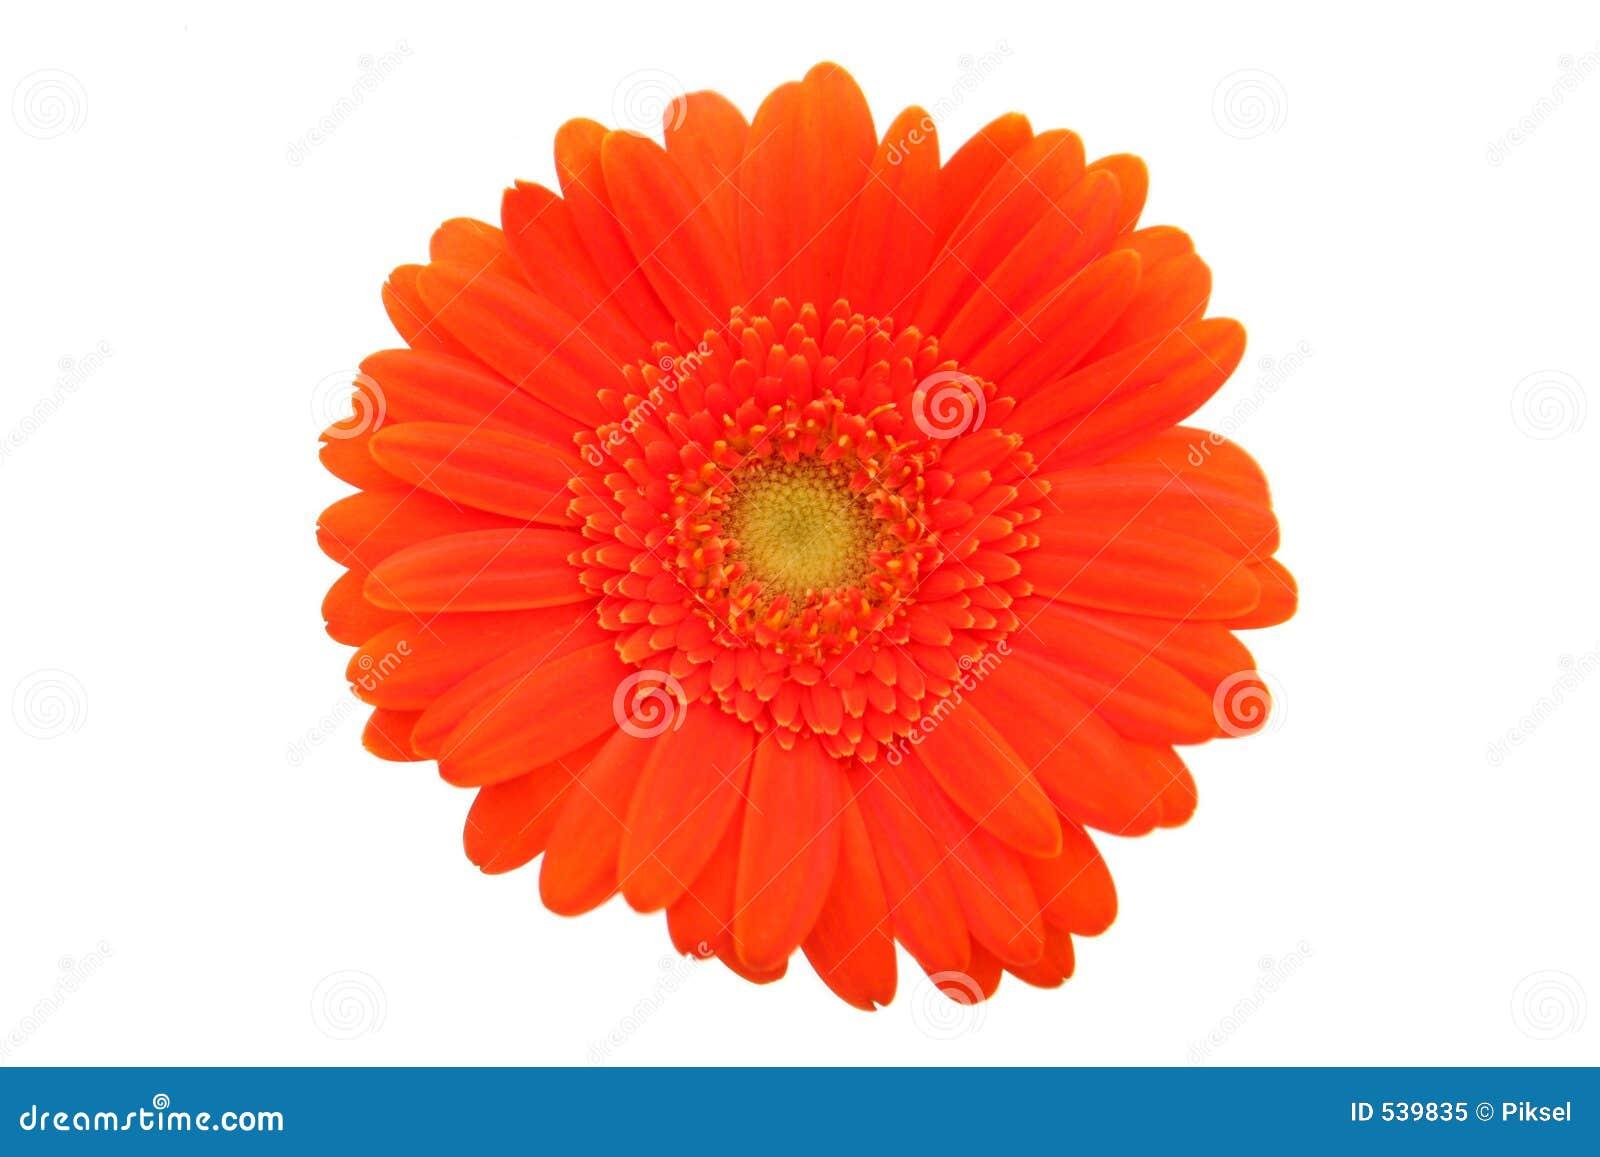 Download 雏菊大丁草 库存图片. 图片 包括有 精美, 自然, 开花的, 庭院, 工厂, gerber, 剪切, 对象 - 539835